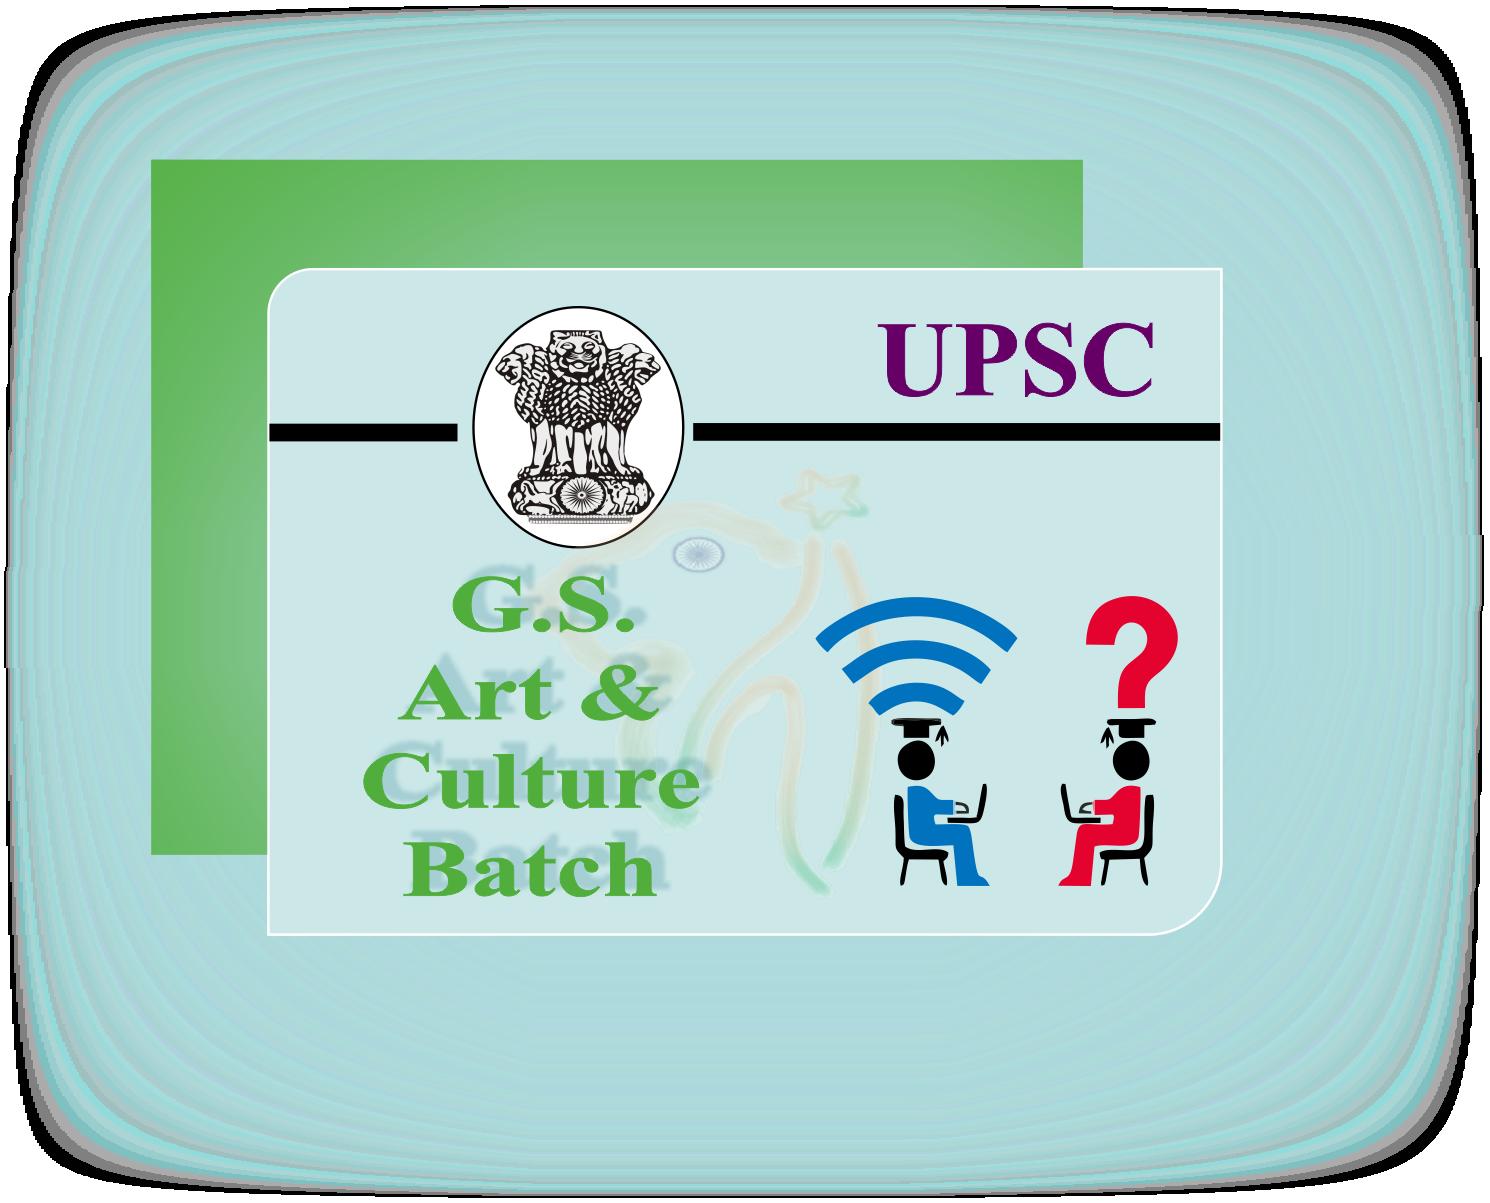 UPSC GS- Art & Culture Batch